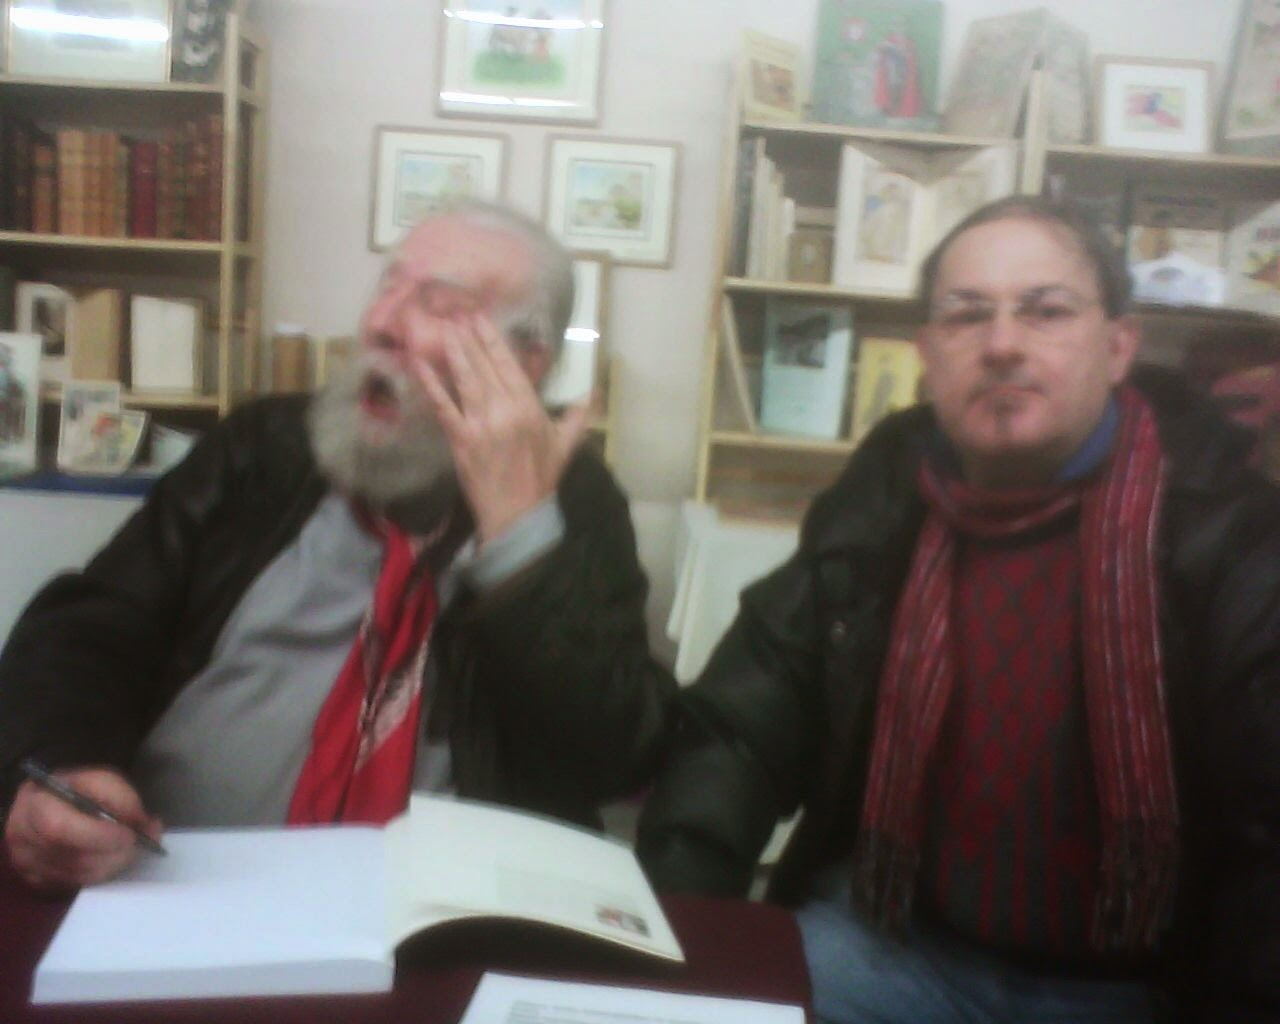 COUTARELLI  AVEC  JEAN  PIERRE  DESCLOUZEAUX  IN  CHAMBERET  BOOK  SALON  15/2/15